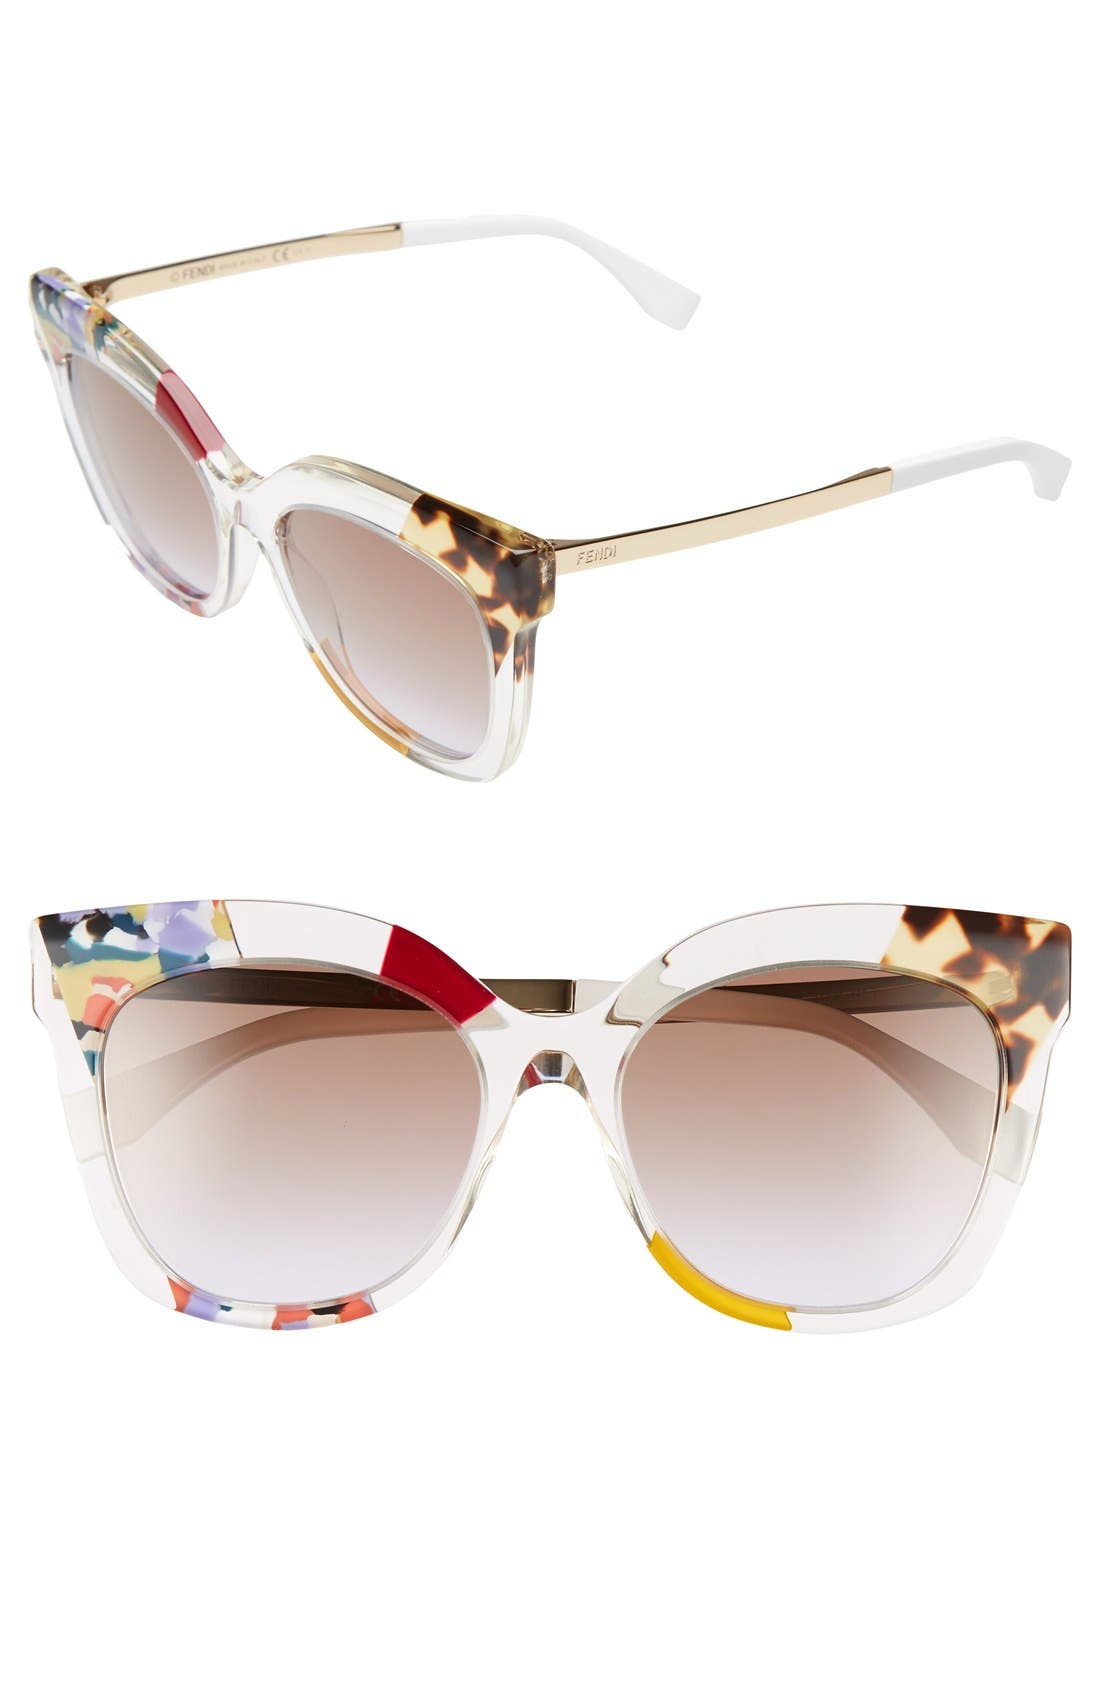 53mm Retro Sunglasses,                             Main thumbnail 1, color,                             Honey/ Crystal